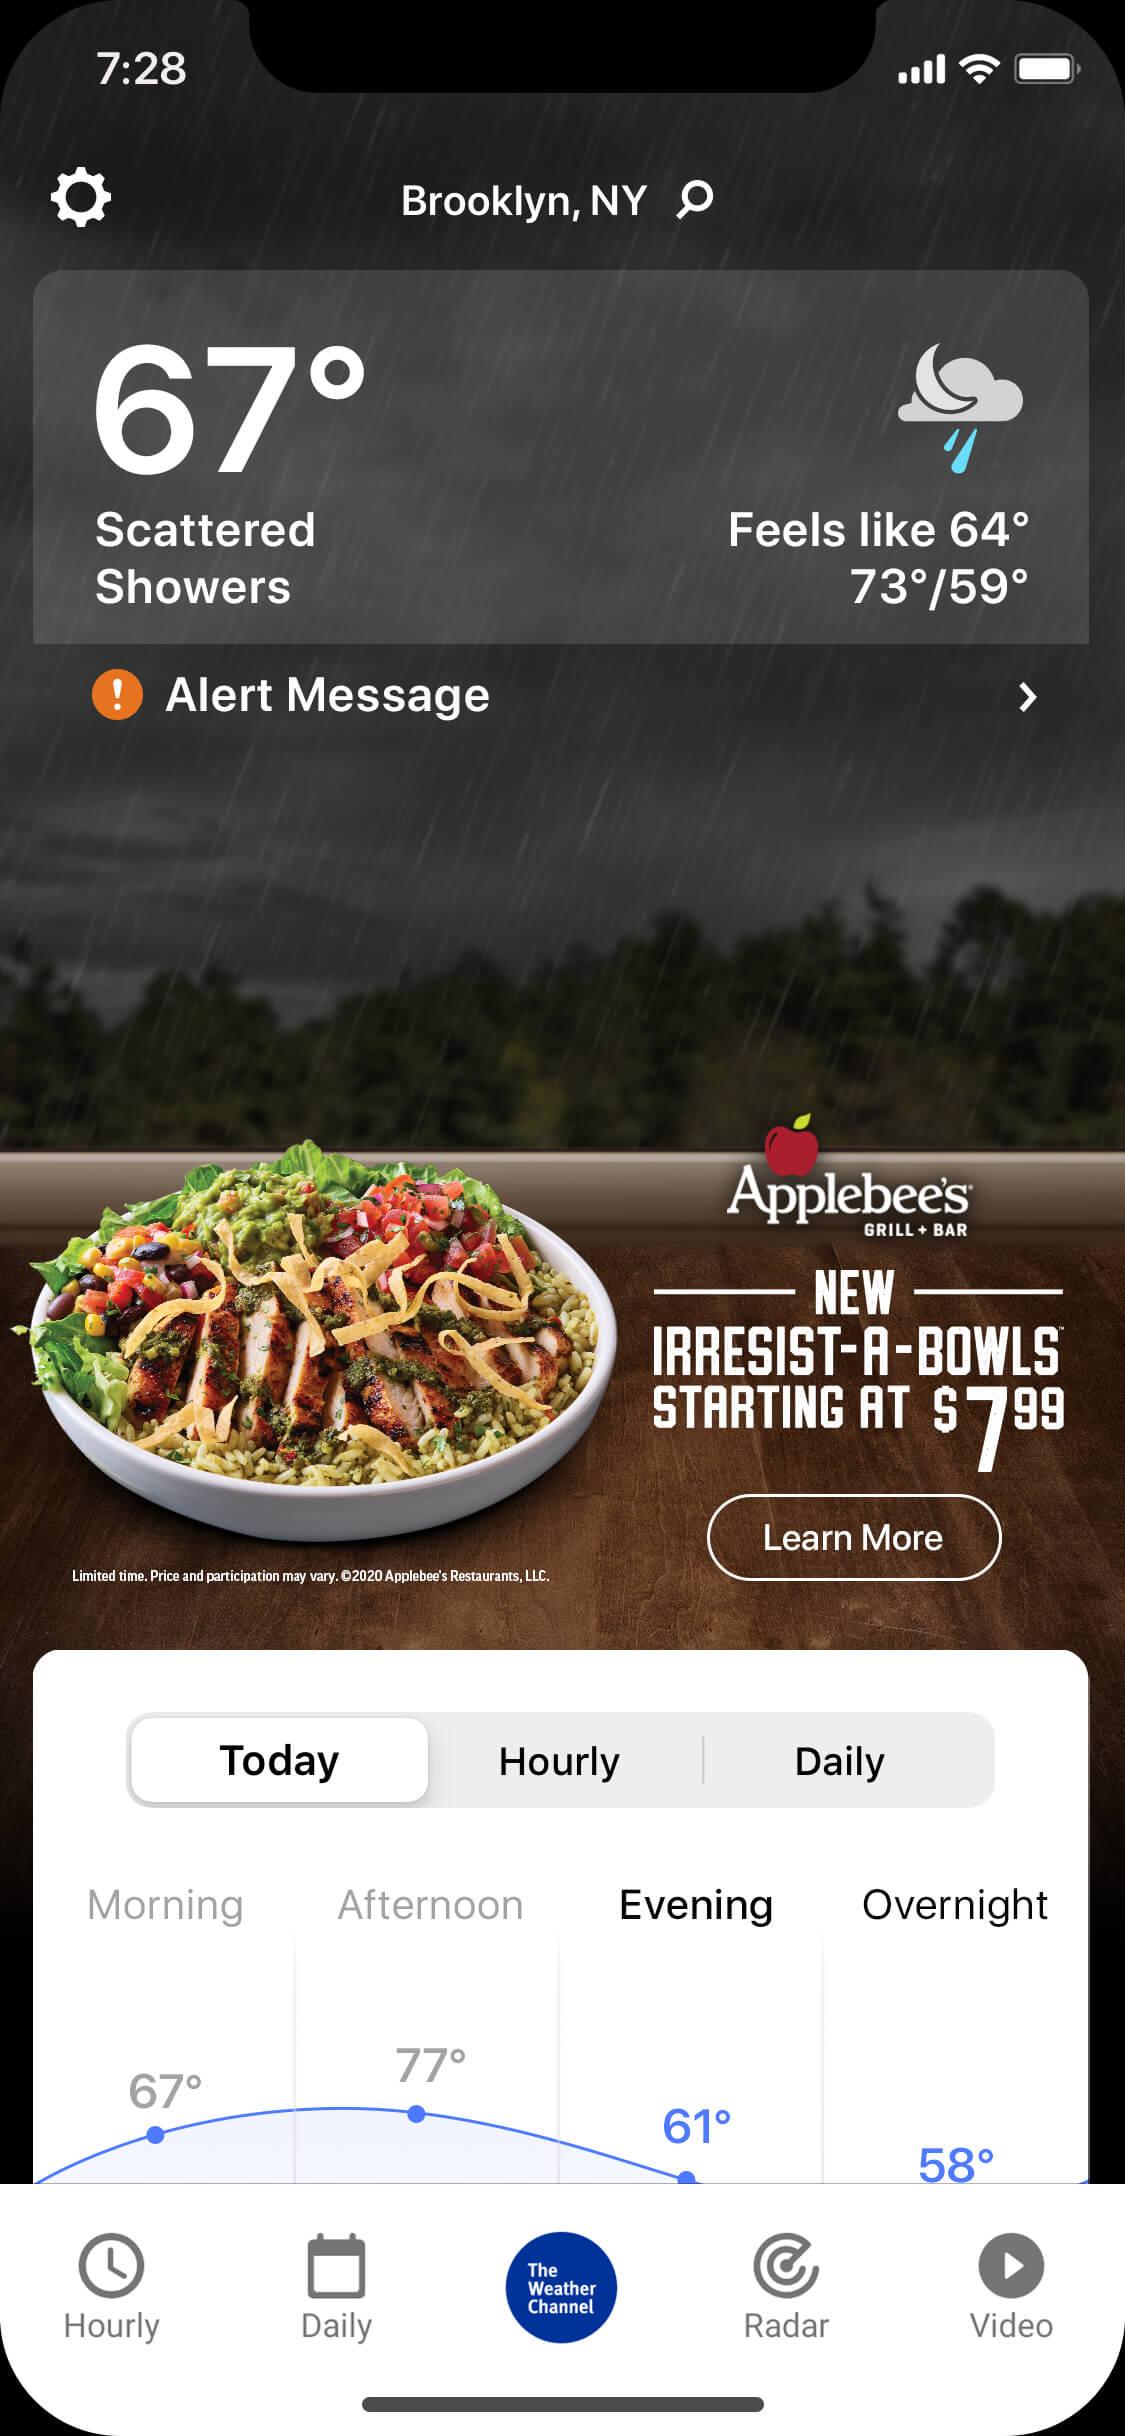 applebees-bowls-im_rainy-night